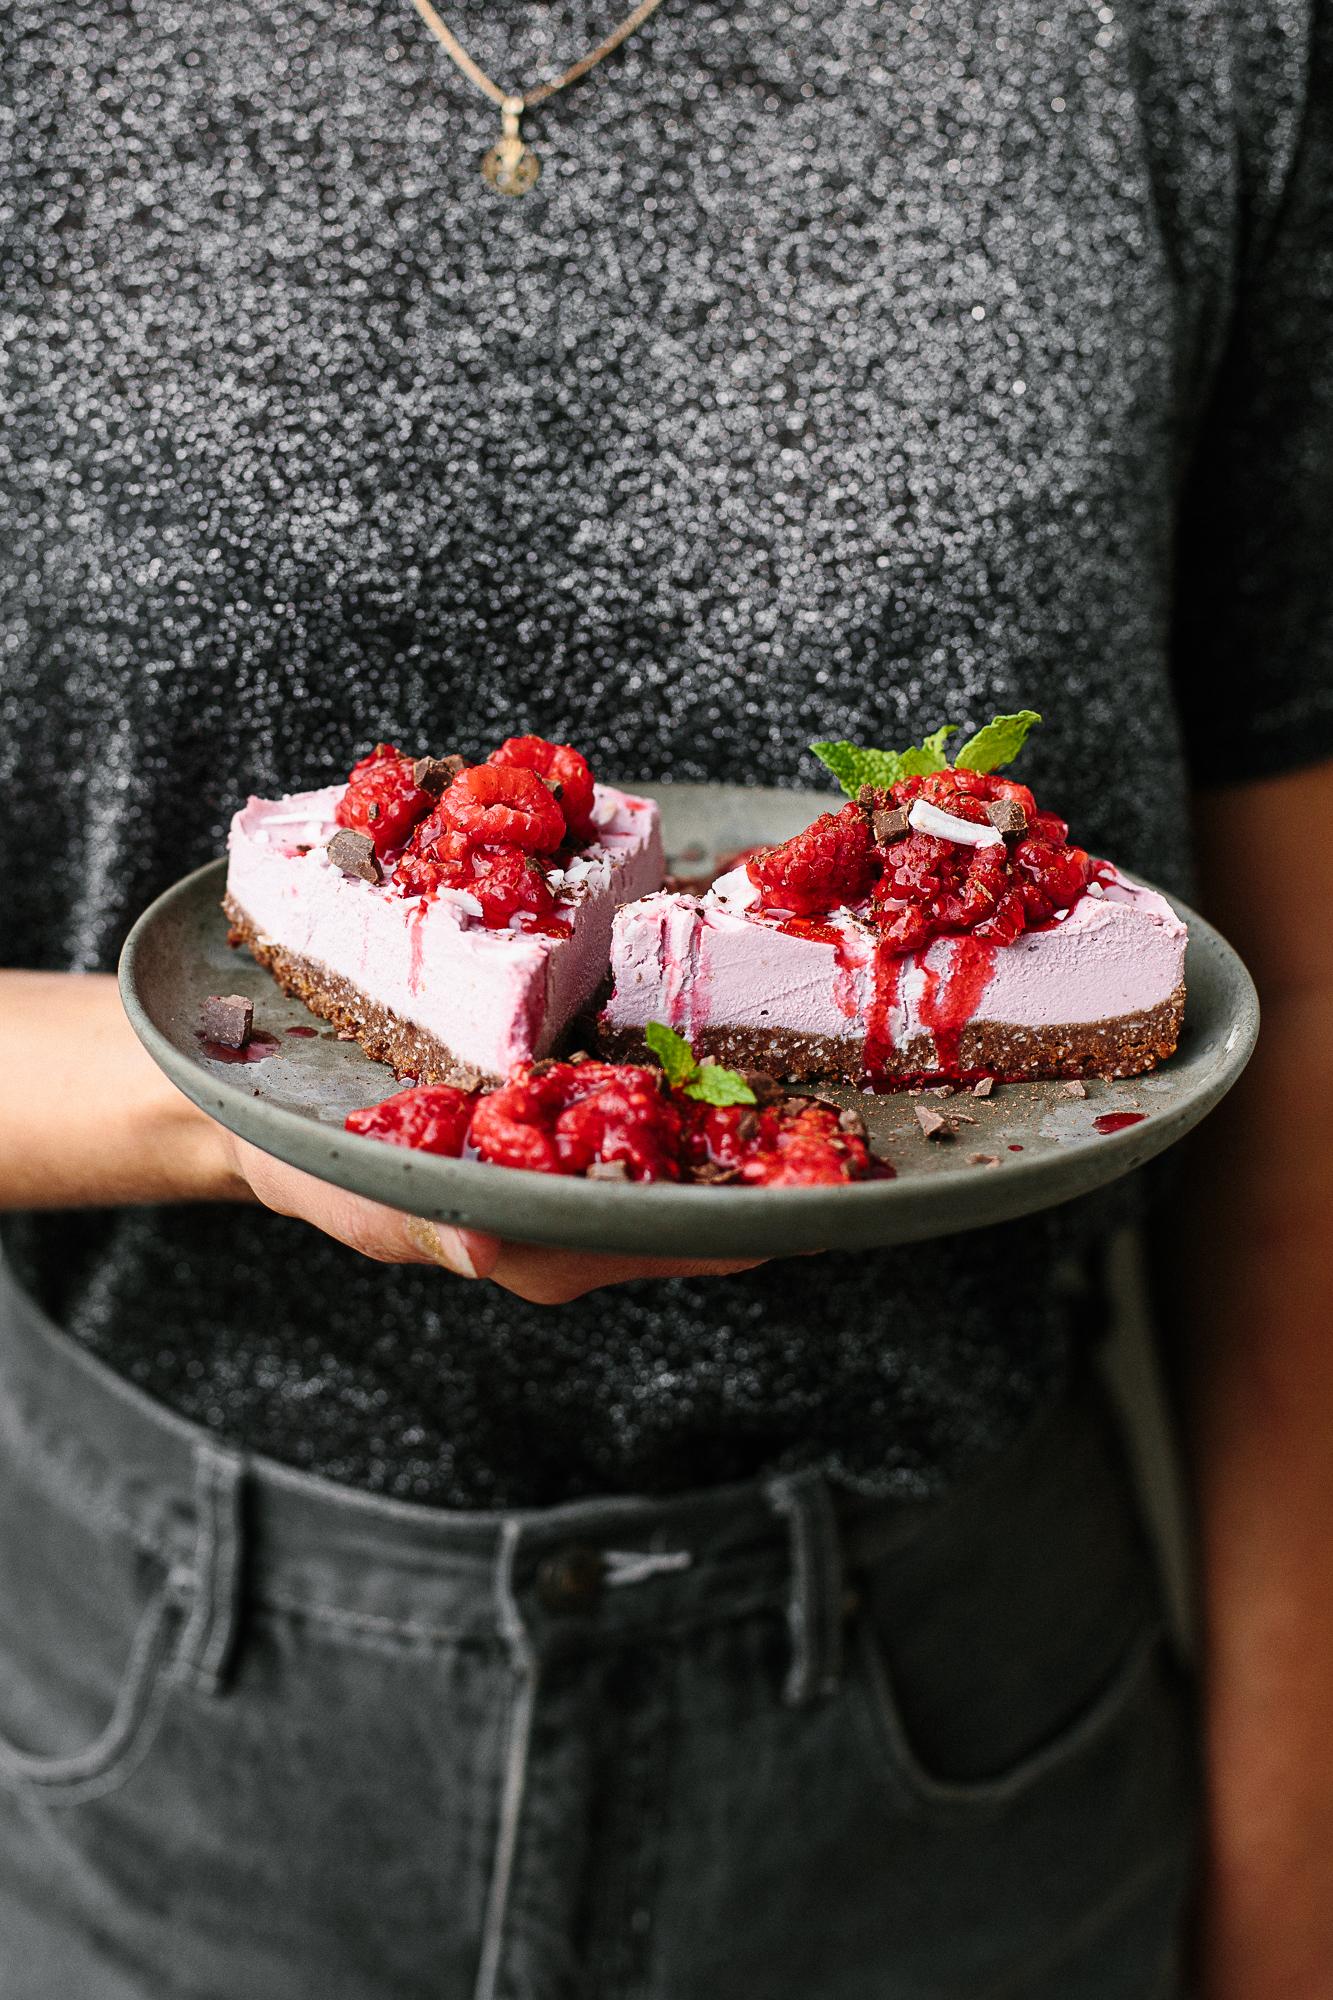 RealLifeofPie_Chocolate&Raspberry_Coconut_Cultured_Cheesecake-4.jpg